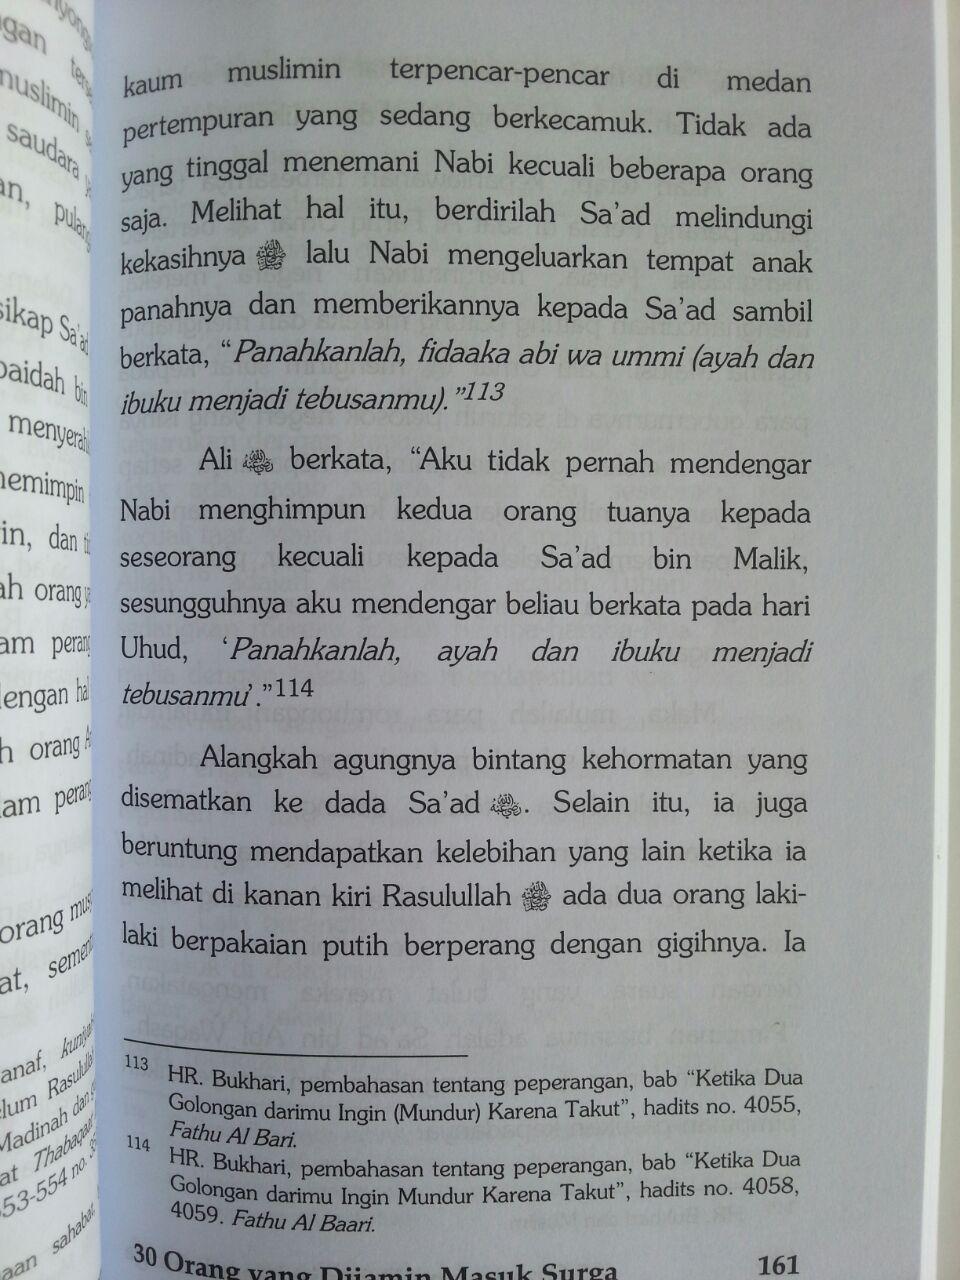 Buku 30 Orang Yang Dijamin Masuk Surga isi 3